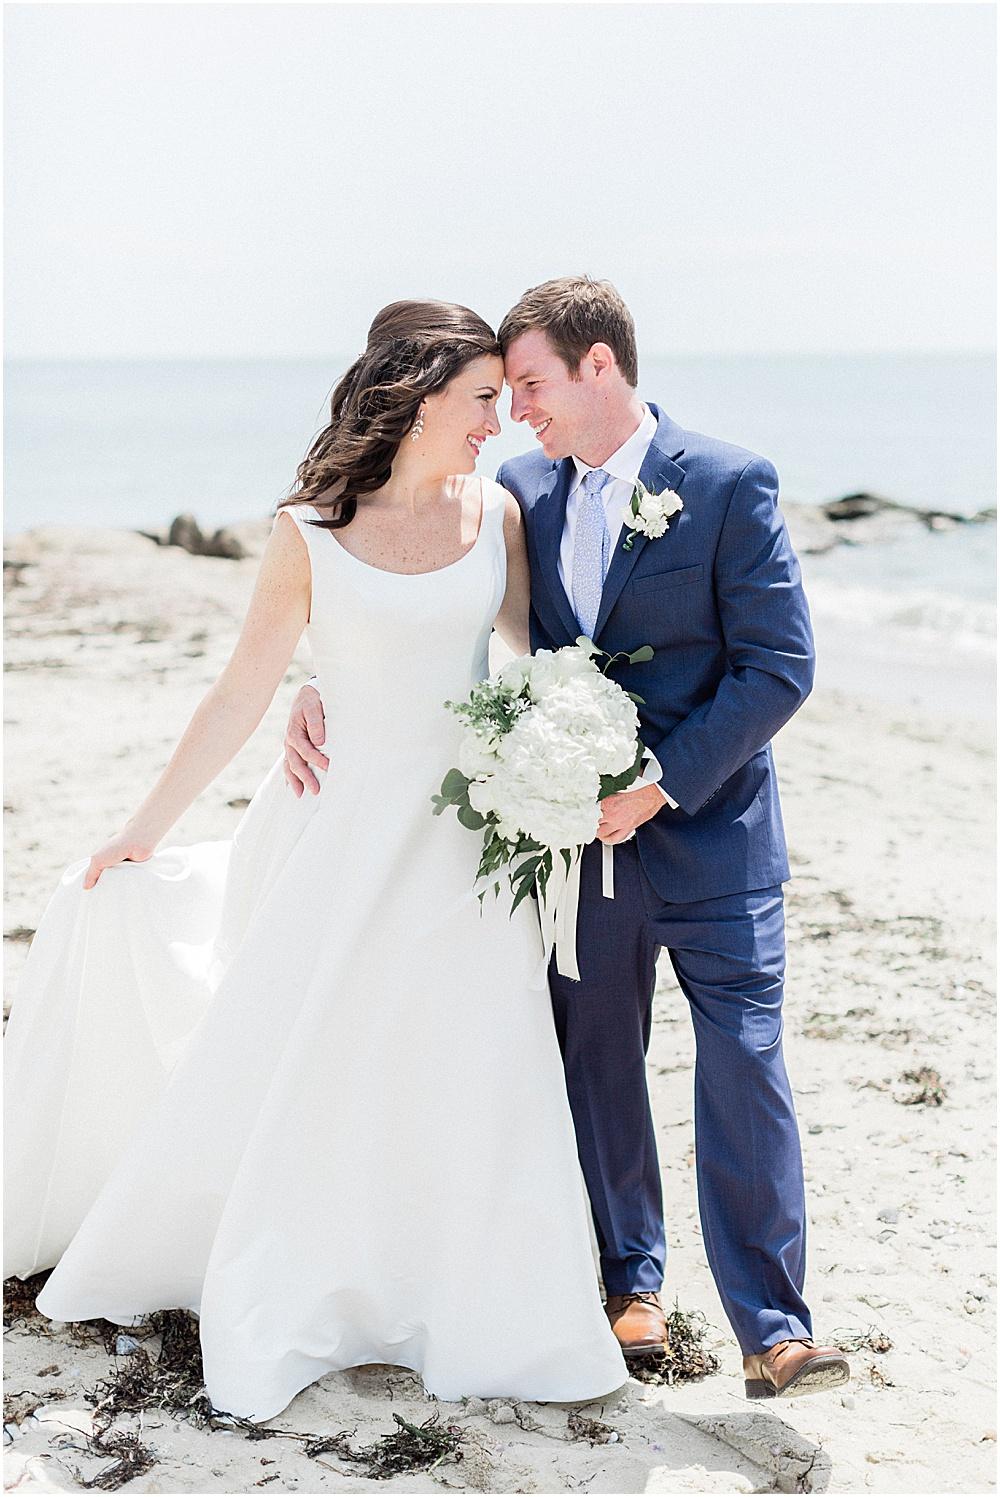 sea_crest_beach_club_st_anthonys_falmouth_old_silver_massachusetts_boston_wedding_photographer_meredith_jane_photography_photo_0395.jpg